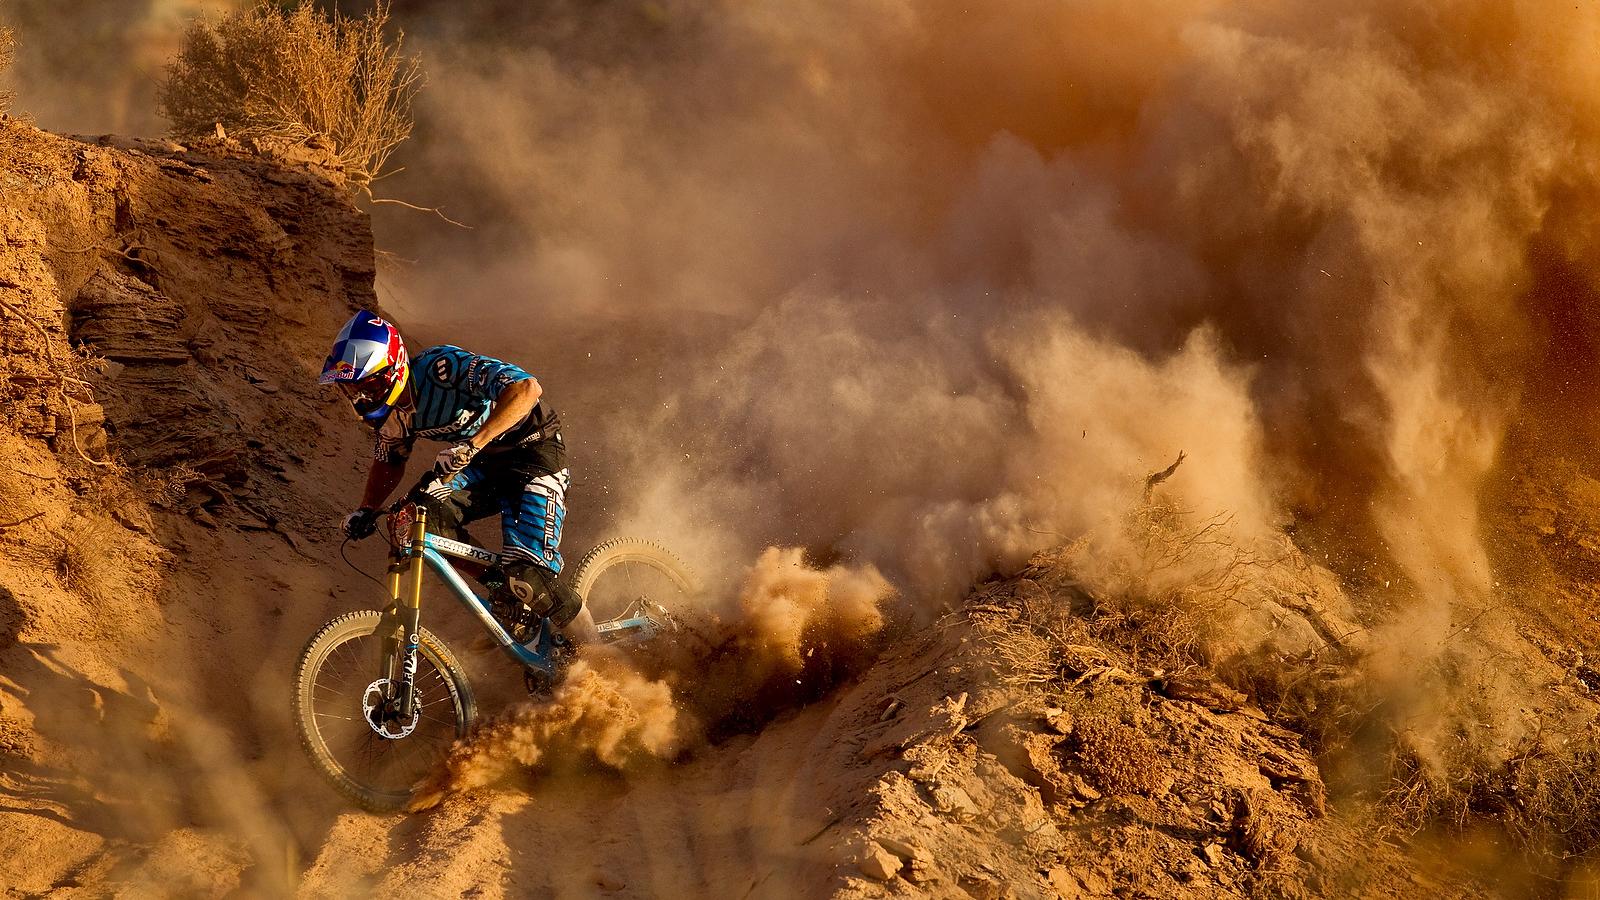 Mountain Bike Wallpaper HD - WallpaperSafari